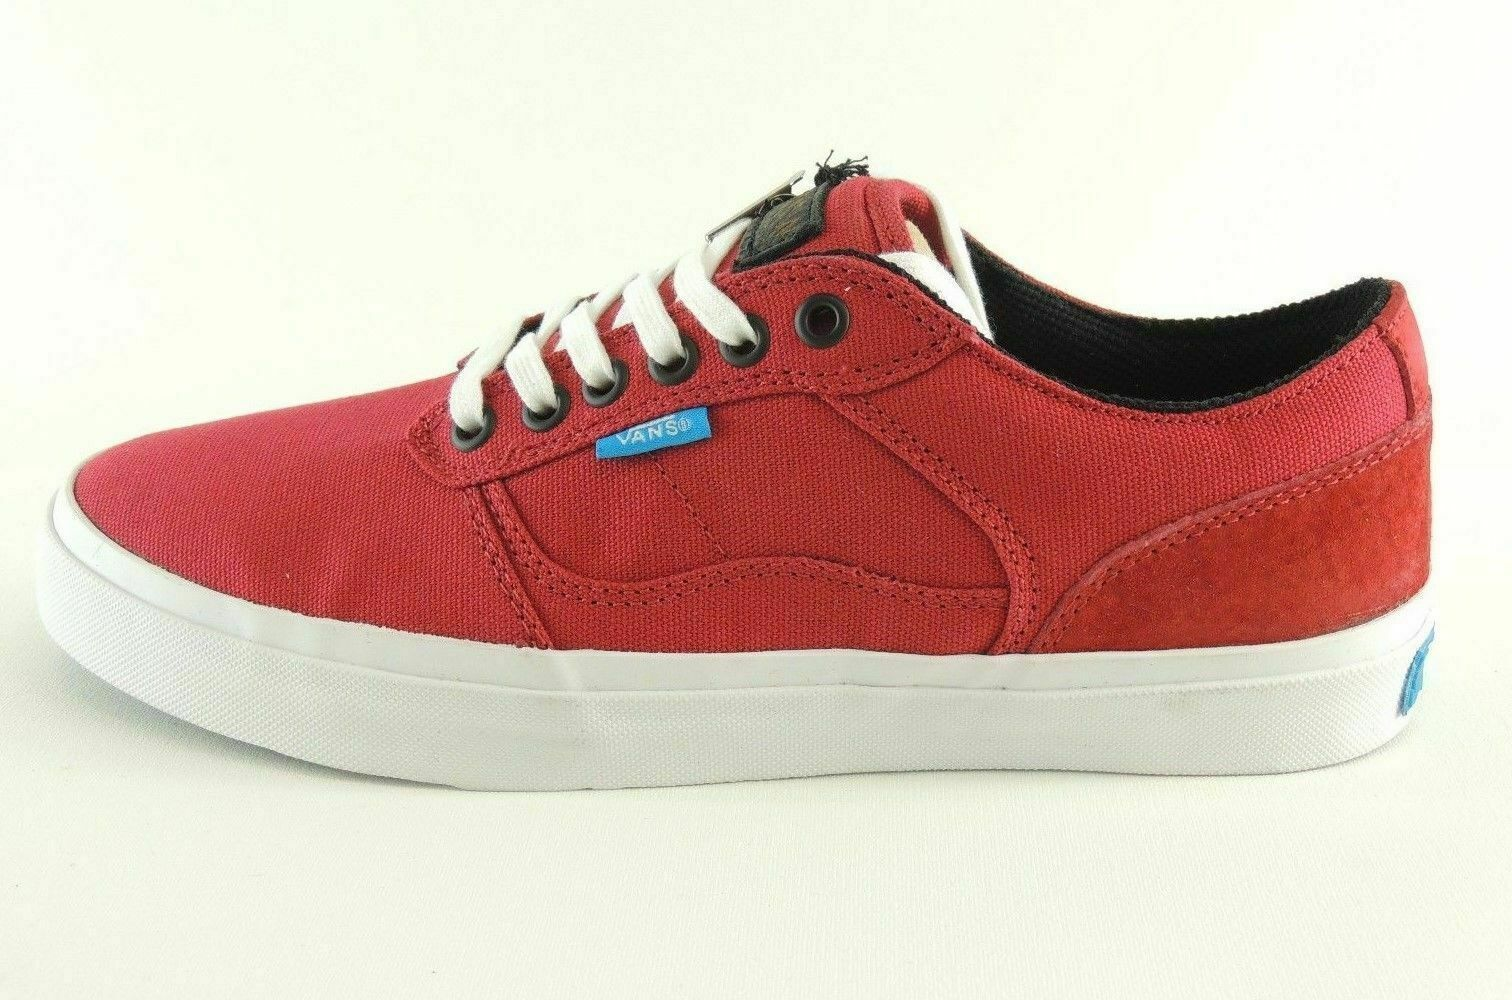 Vans Bedford Low Herren Schuhe Unisex Sneaker Shoes Skate Skateboard Authentic